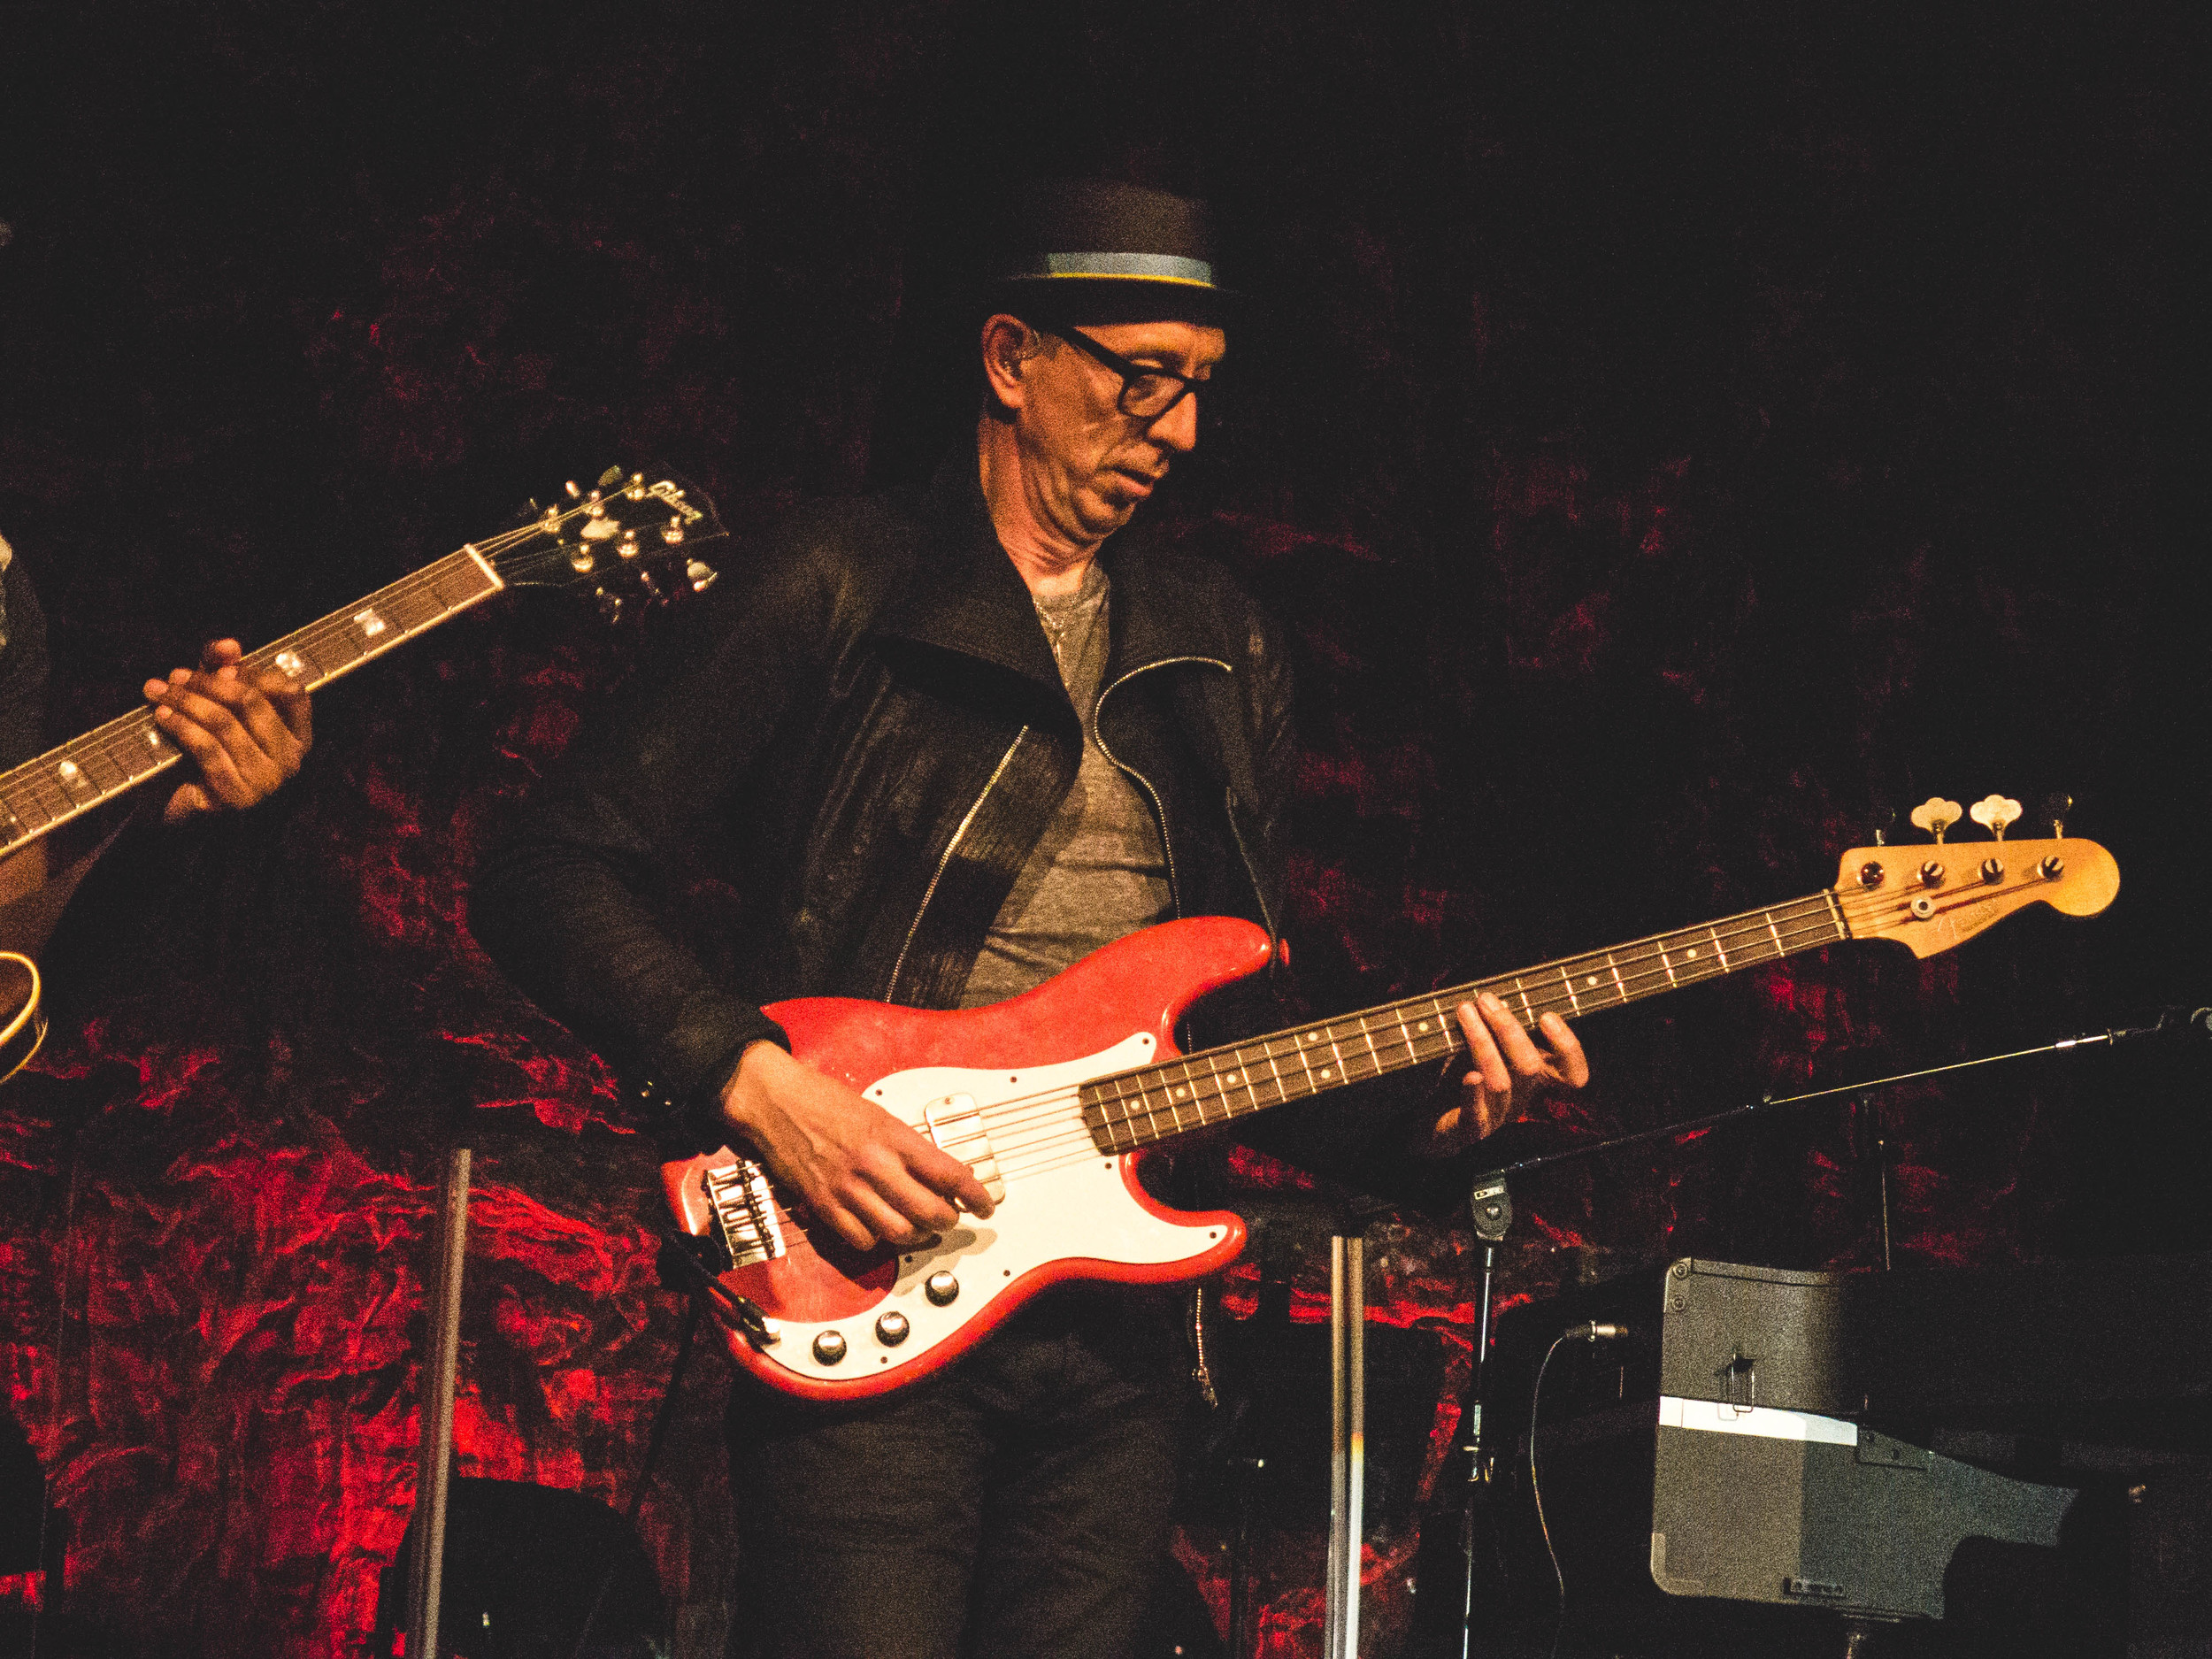 Master of the bass, Pino Palladino.